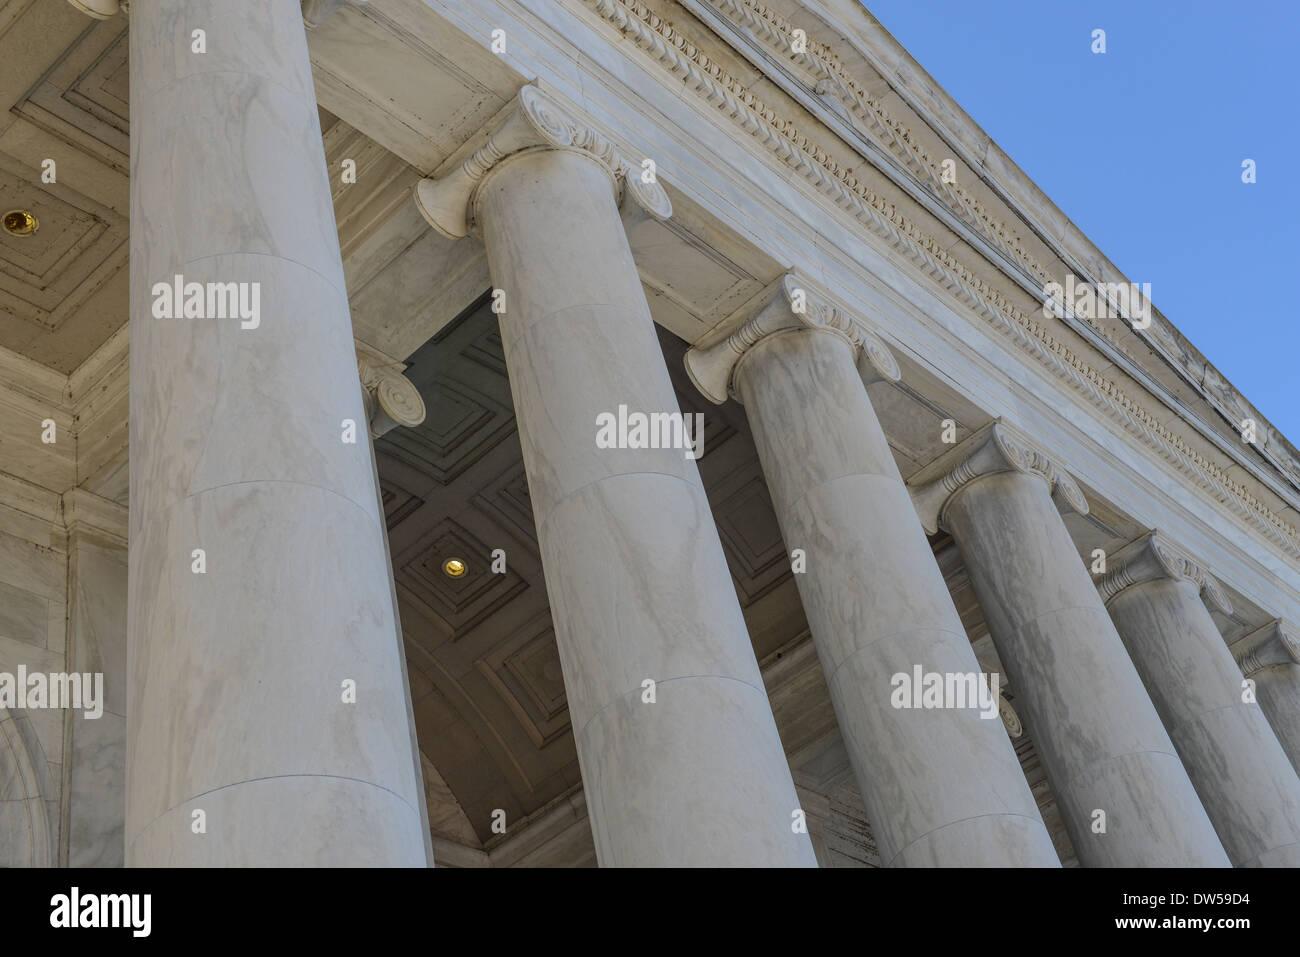 Legal Pillars - Stock Image